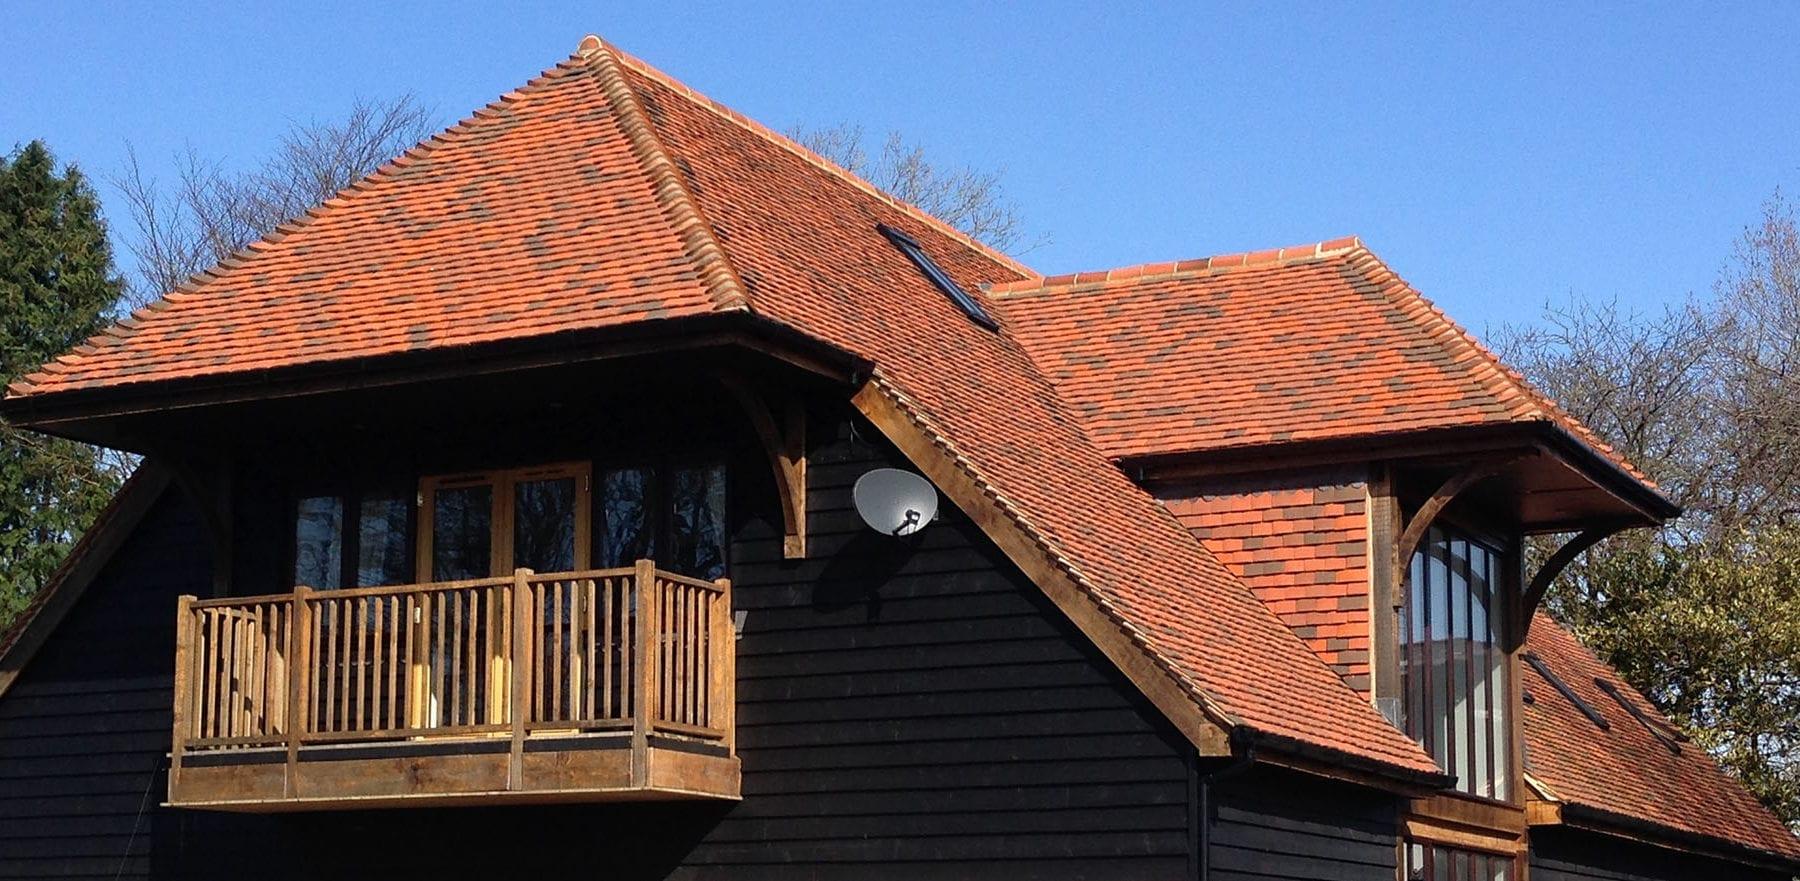 Lifestiles - Handcrafted Tilehurst Clay Roof Tiles - Folkstone, England 4